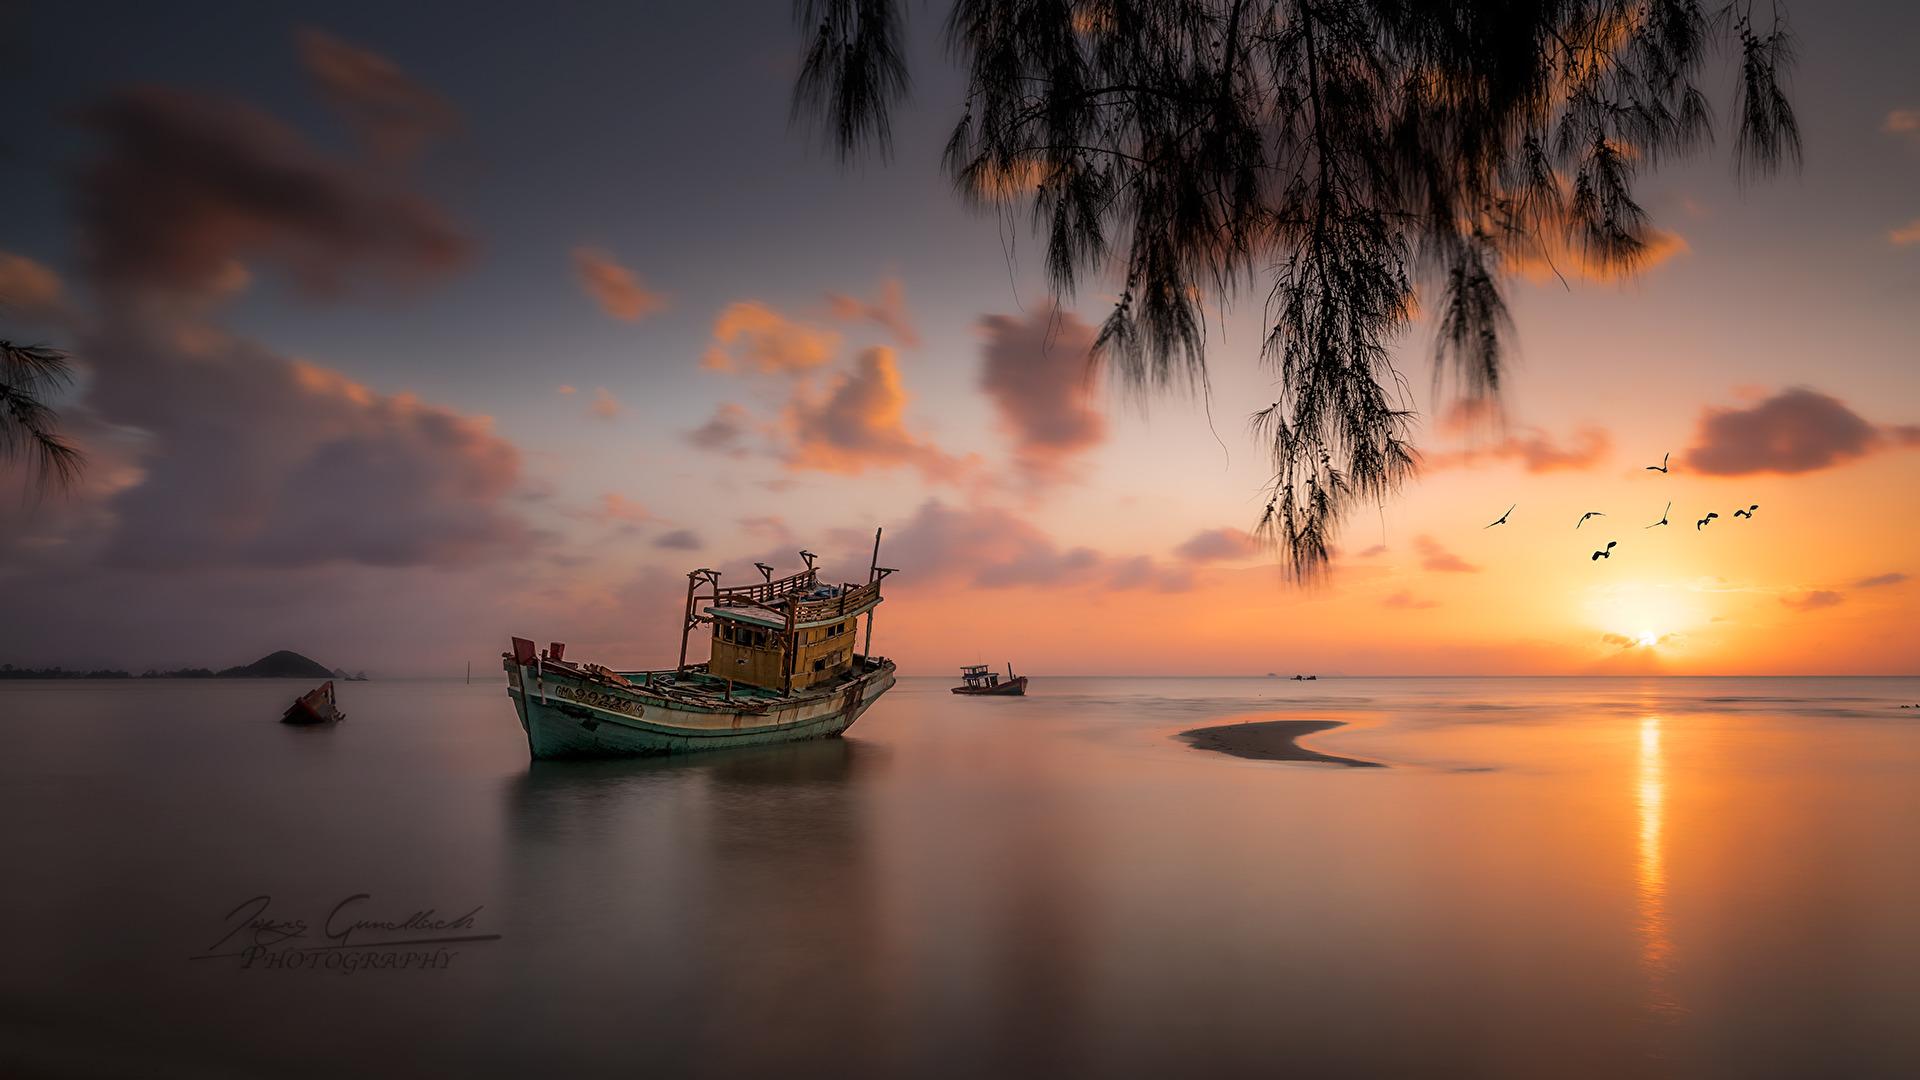 Schiffswrack im Sonnenuntergang